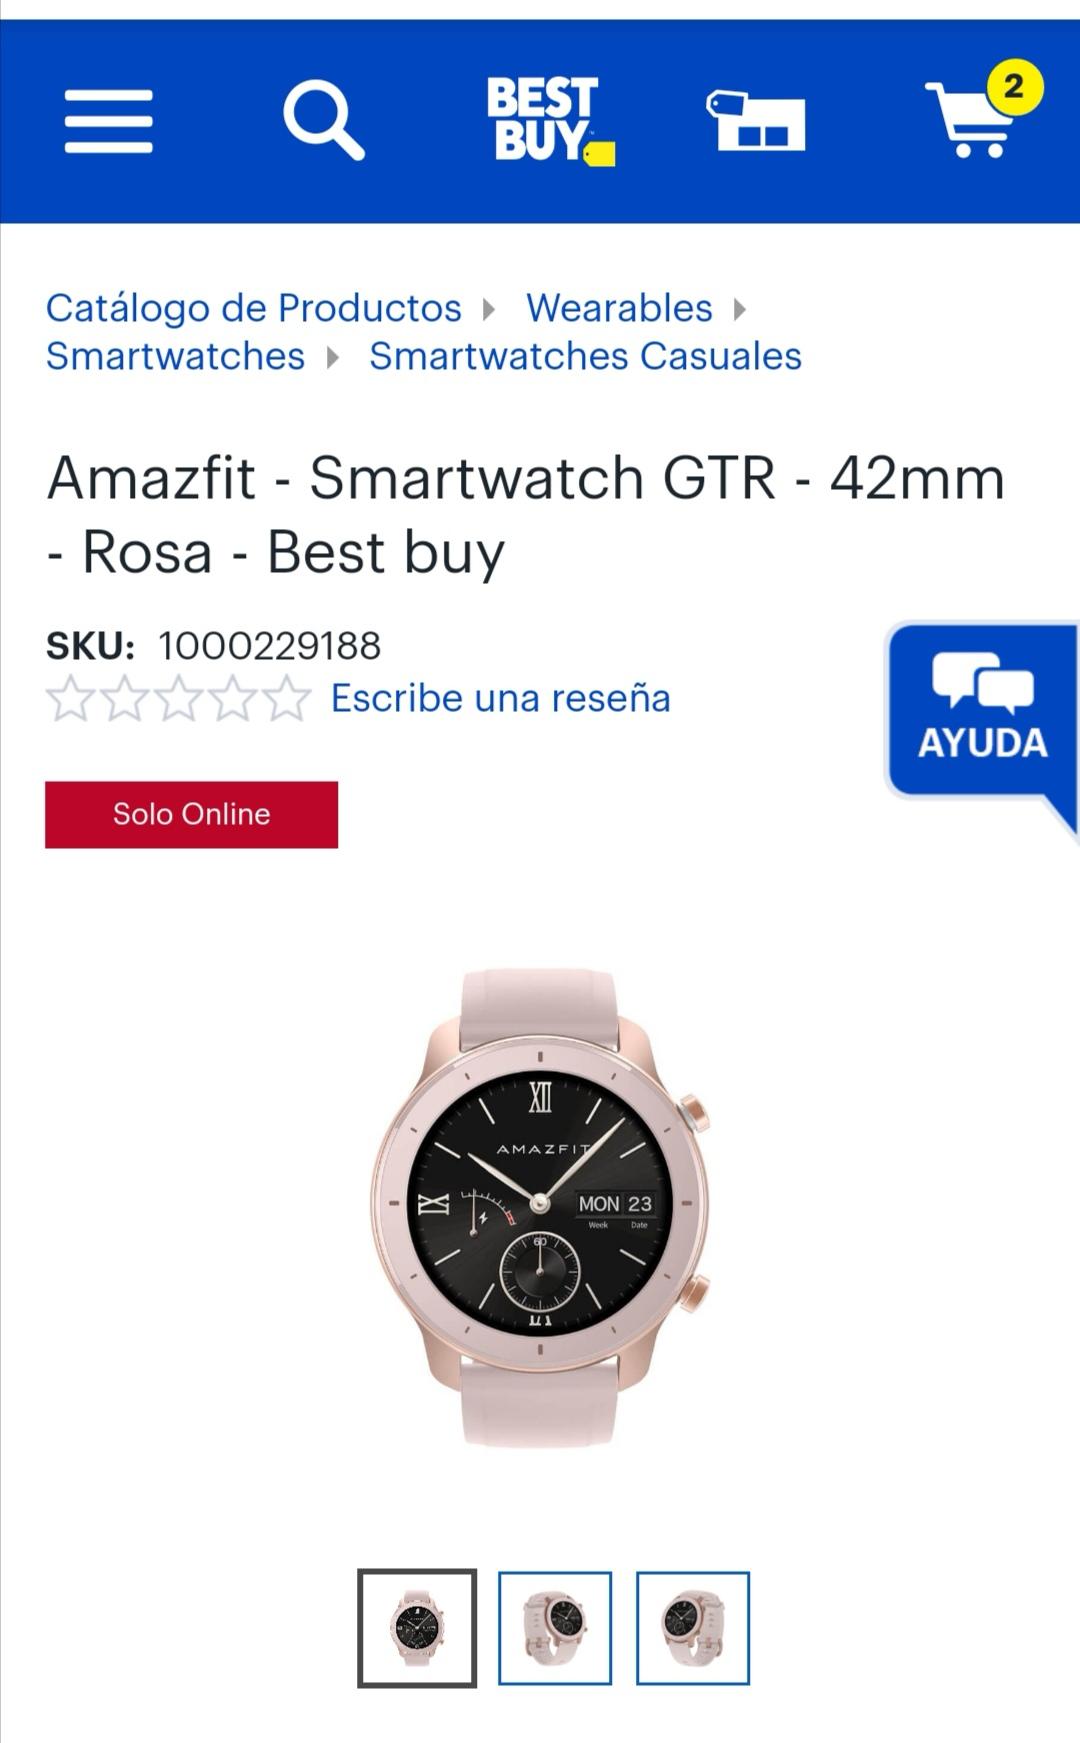 Amazfit - Smartwatch GTR - 42mm - Rosa - Best buy